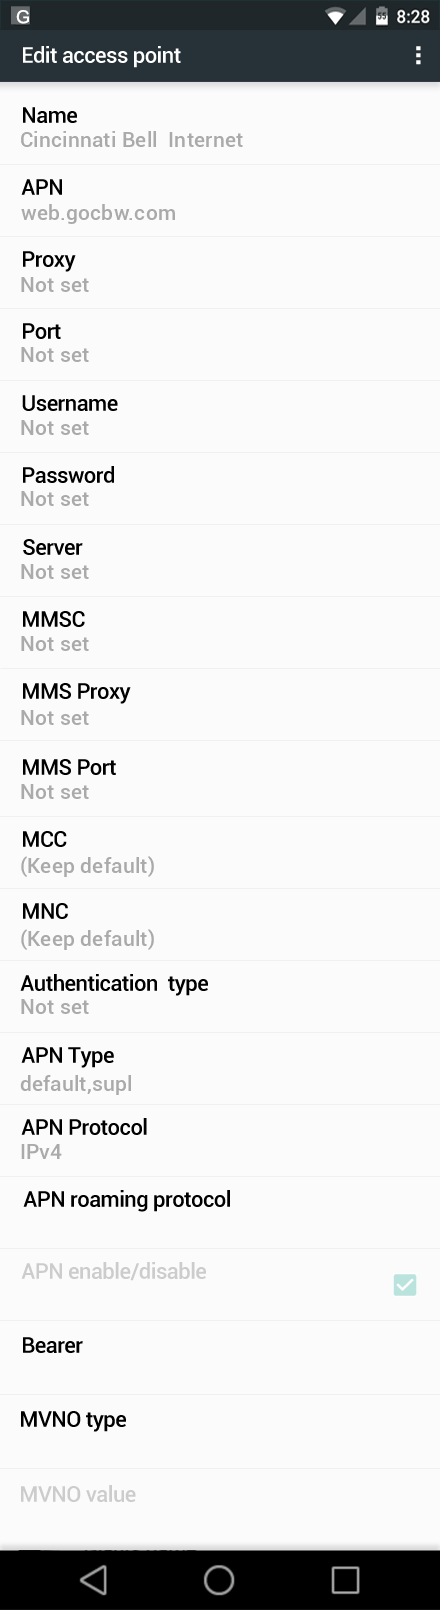 Cincinnati Bell  Internet APN settings for Android Marshmallow screenshot